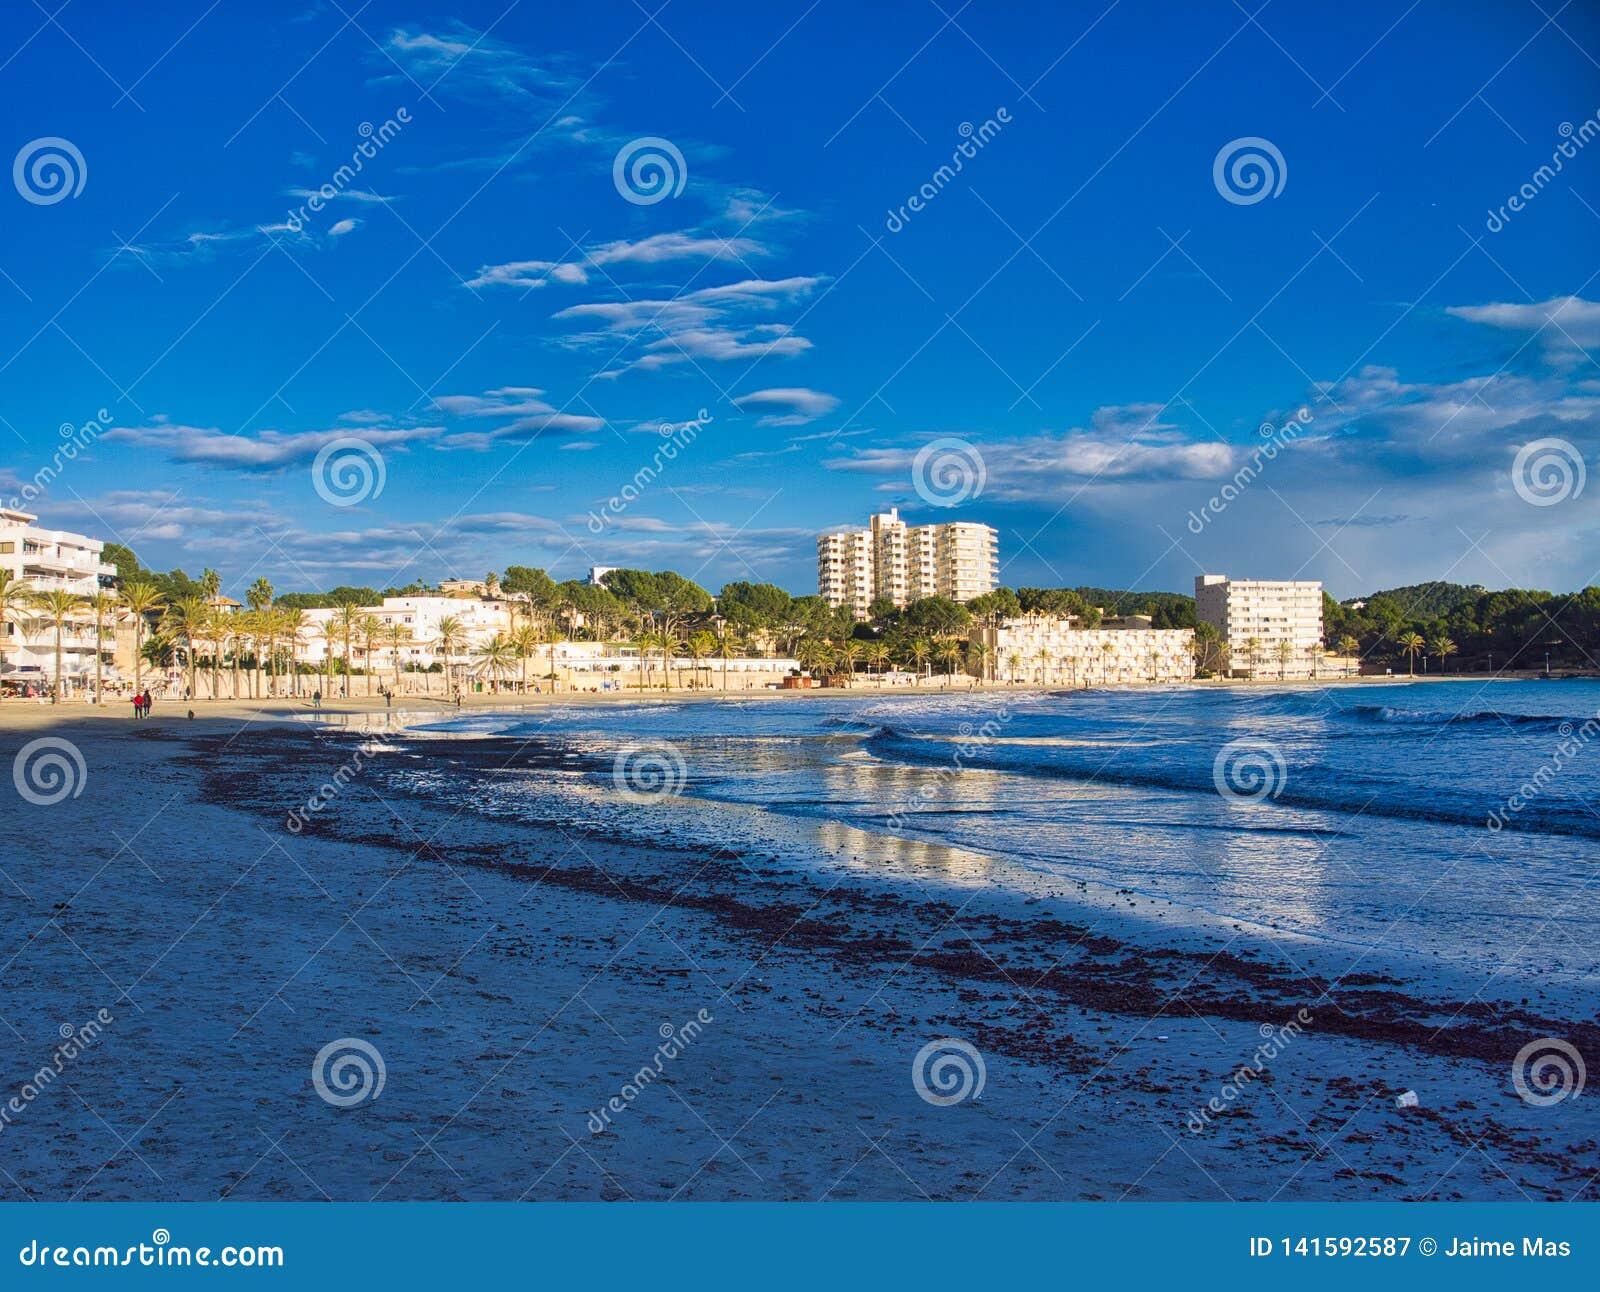 Nice beach view in mallorca island